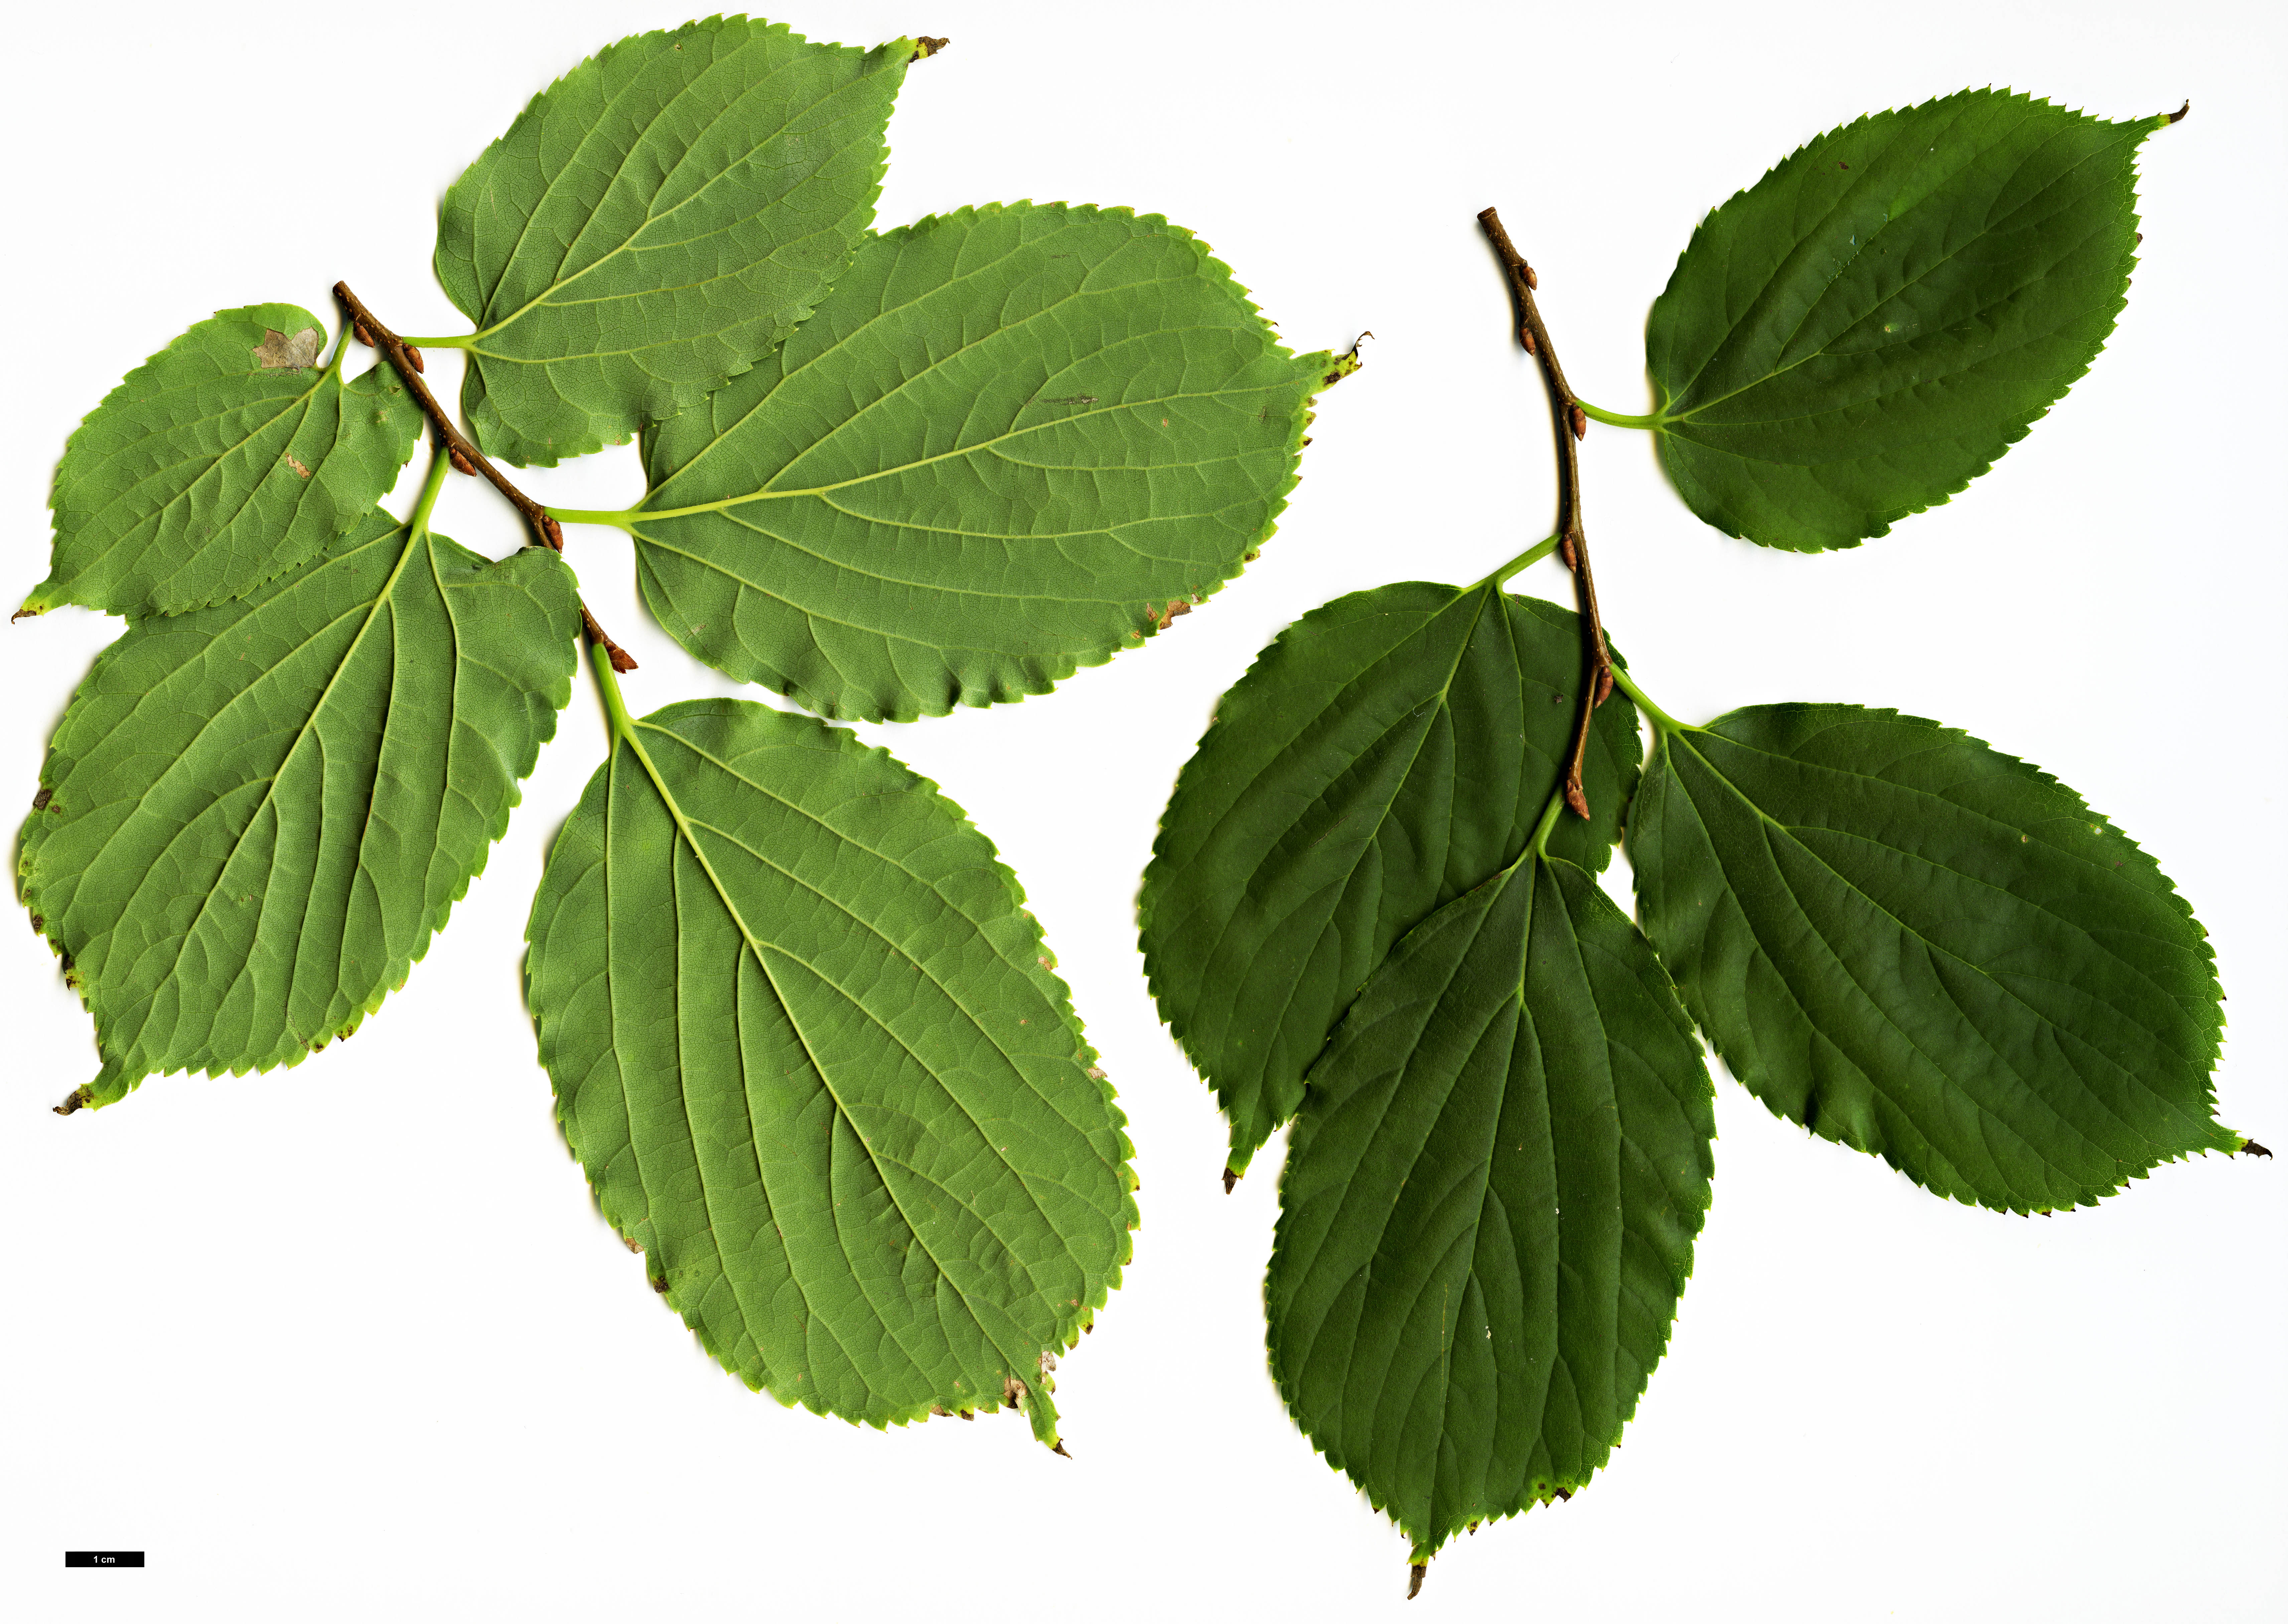 Family Cannabaceae Genus Celtis Specy aurantiaca